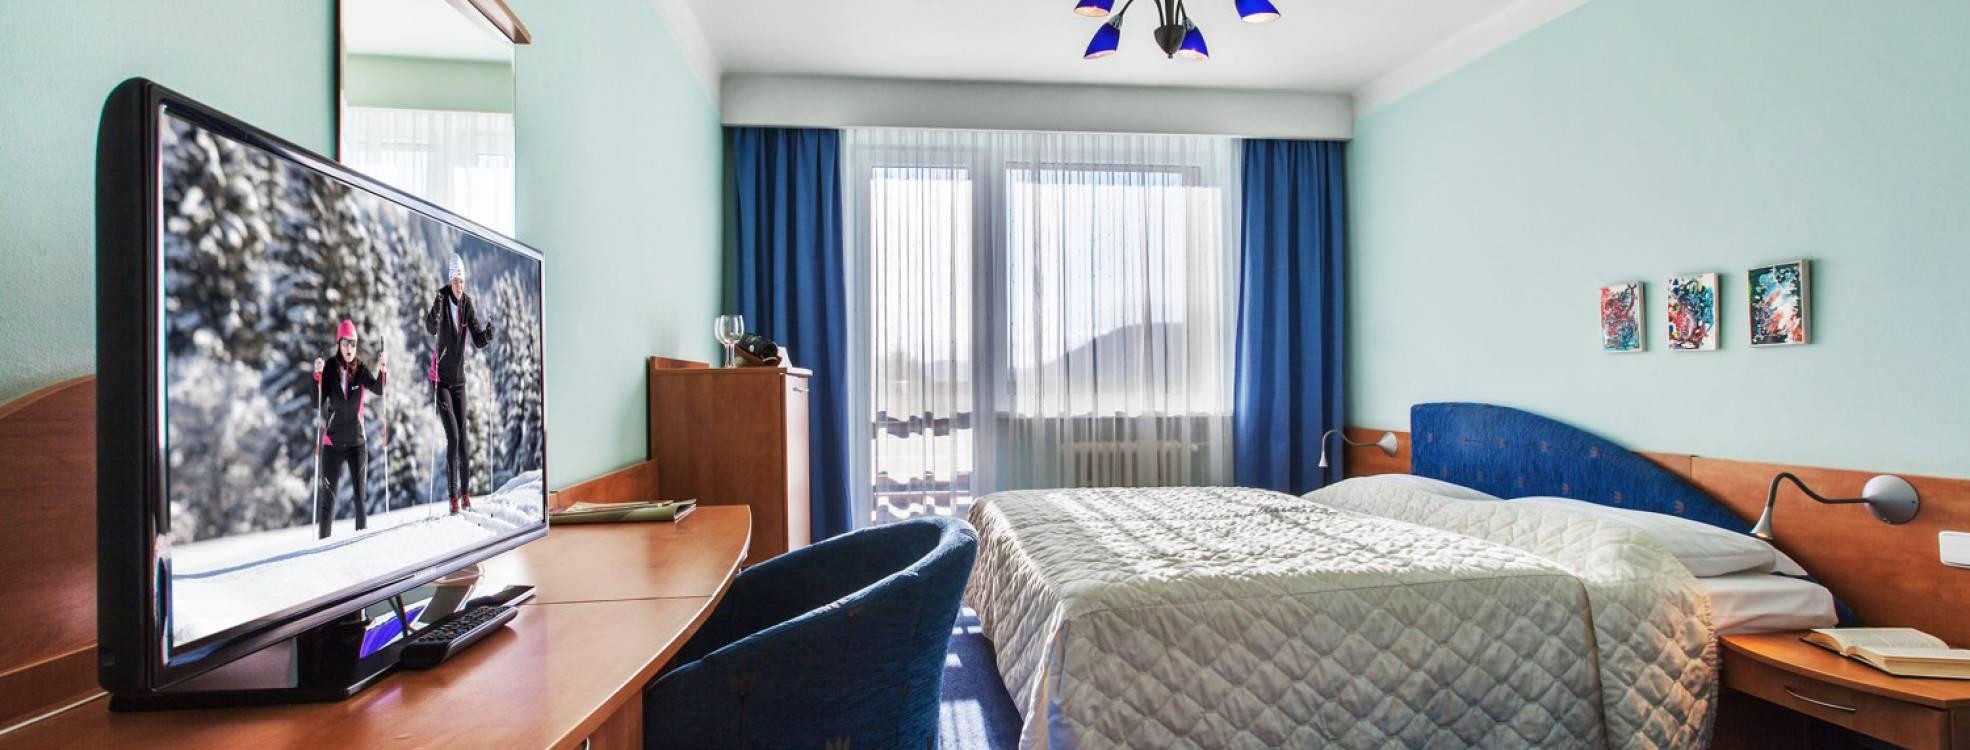 Dvojlôžková izba Economy - Hotel PARTIZÁN